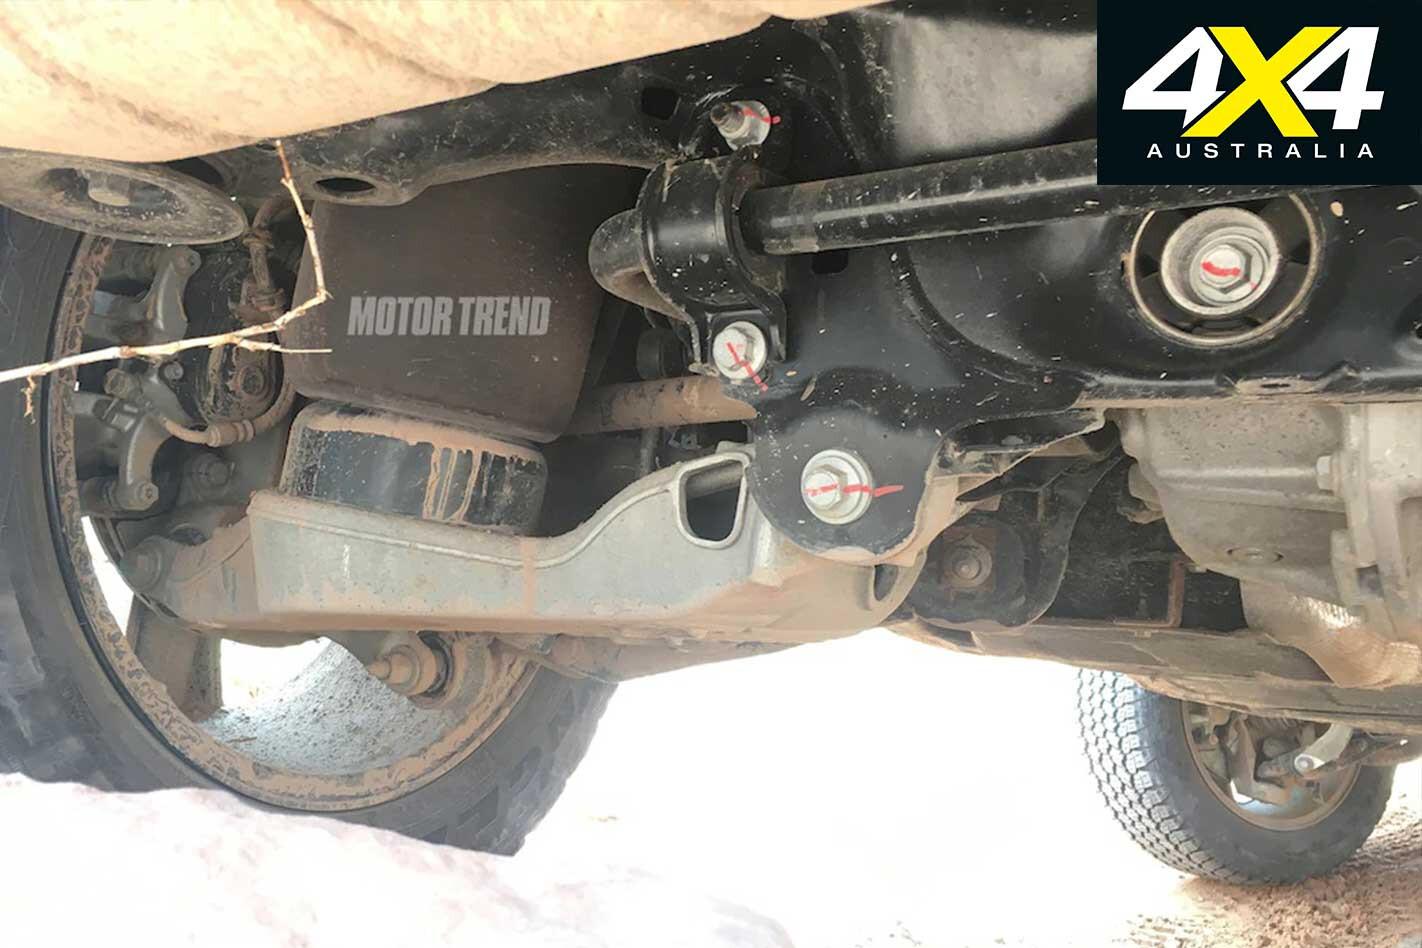 2020 Land Rover Defender suspension